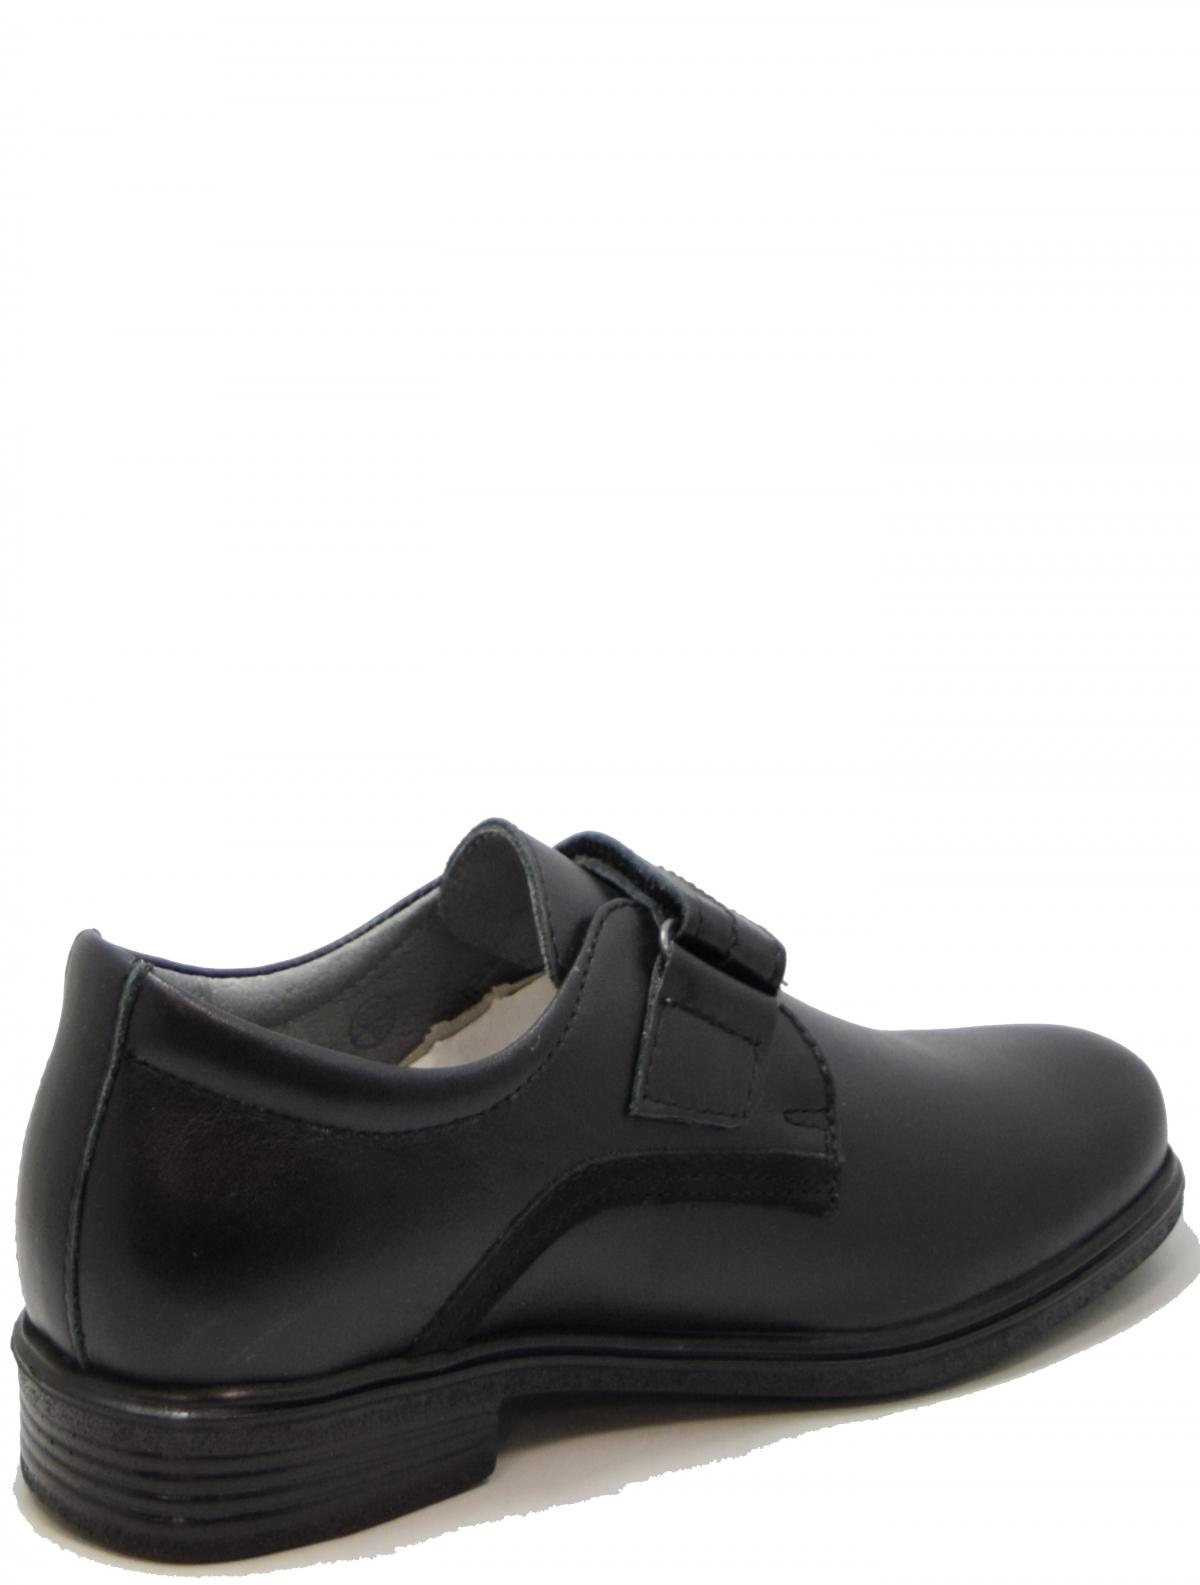 Shagovita 51306 детские туфли